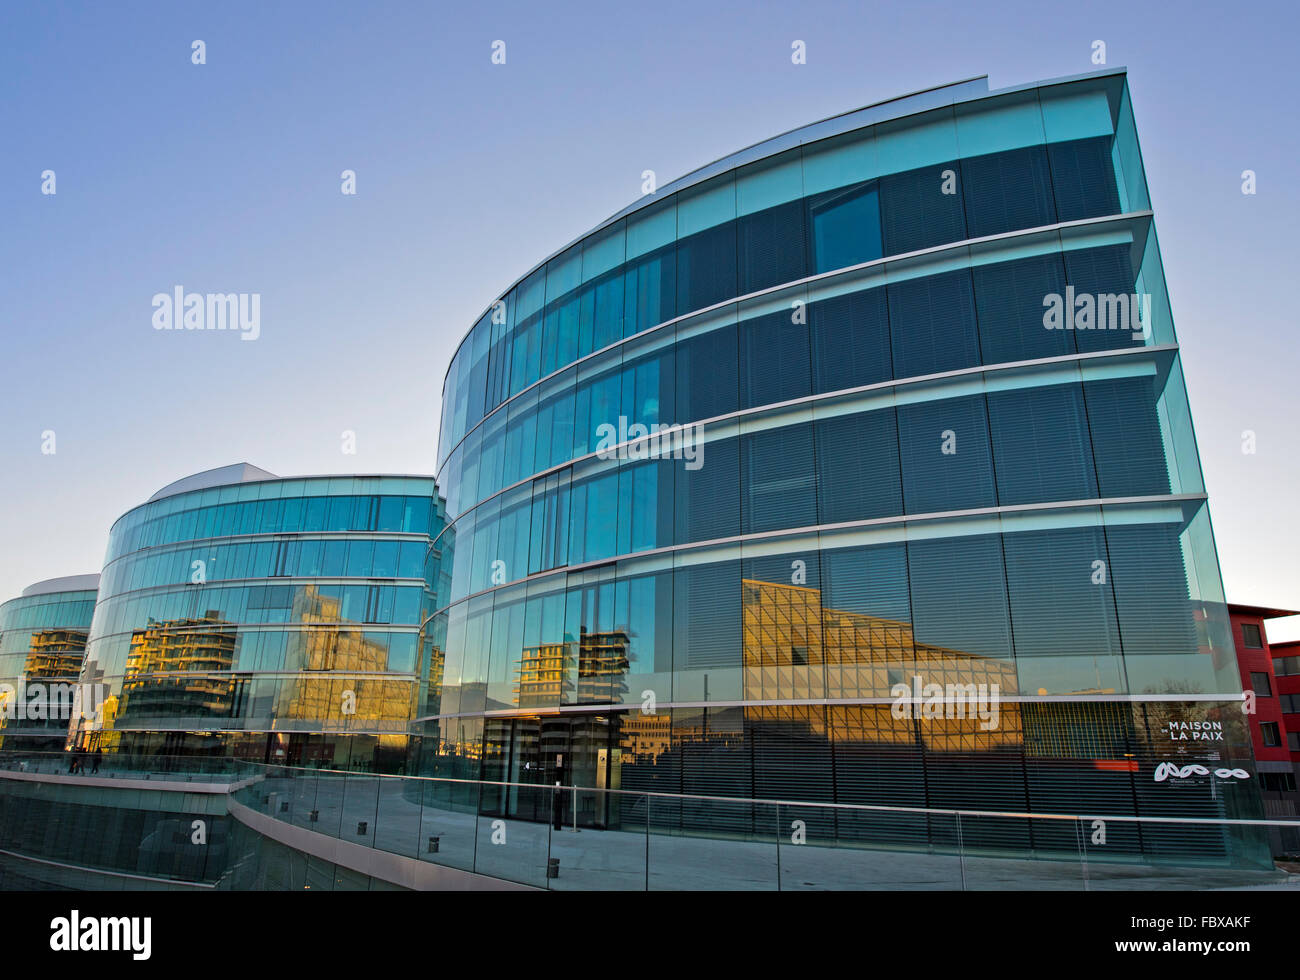 Maison de la paix, Geneva Graduate Institute of International and Development Studies, Geneva, Switzerland - Stock Image